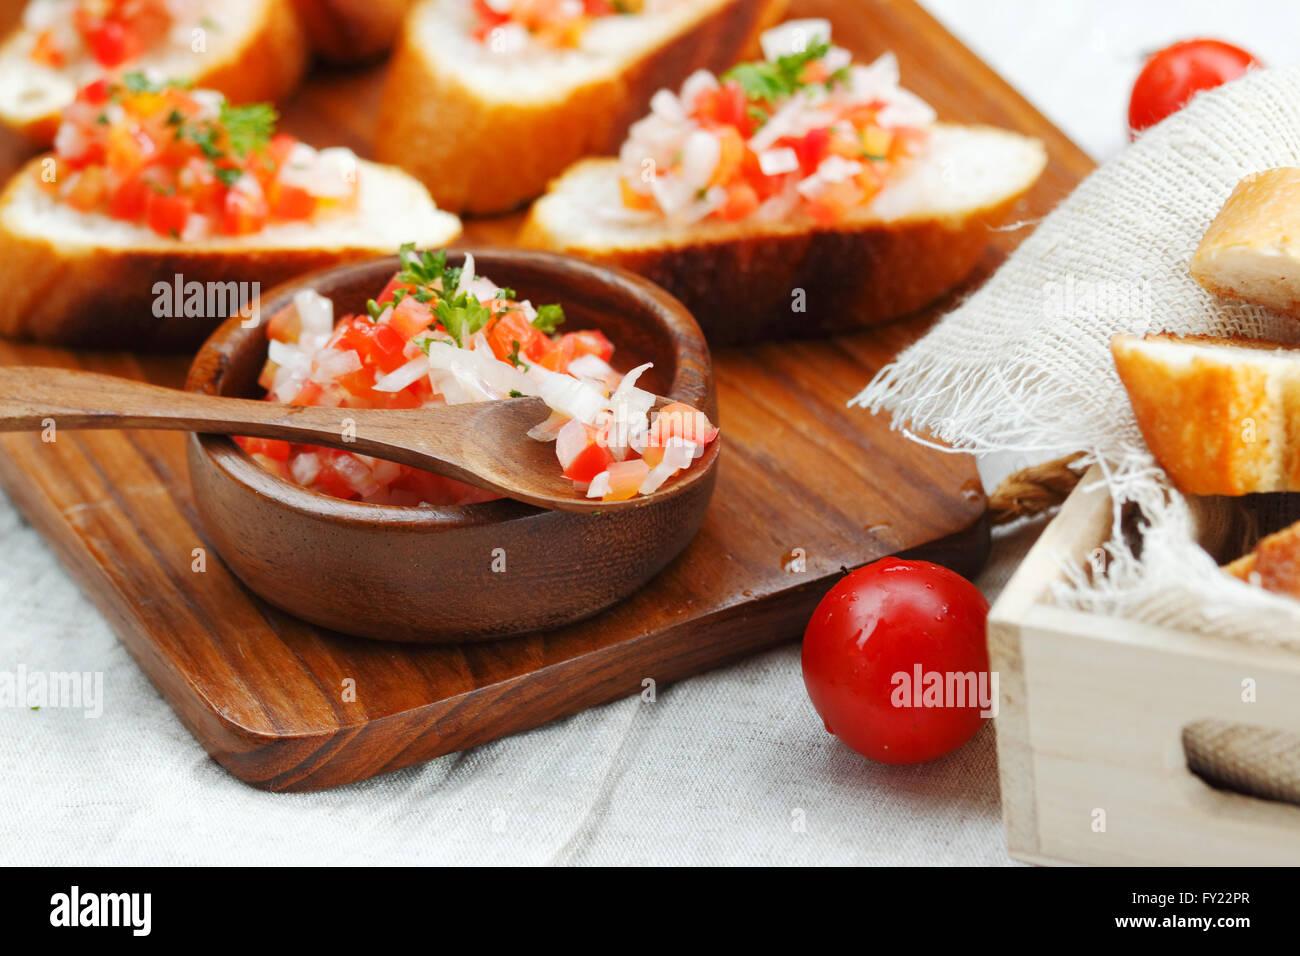 Bruschetta : the most popular Italian appetizer - Stock Image